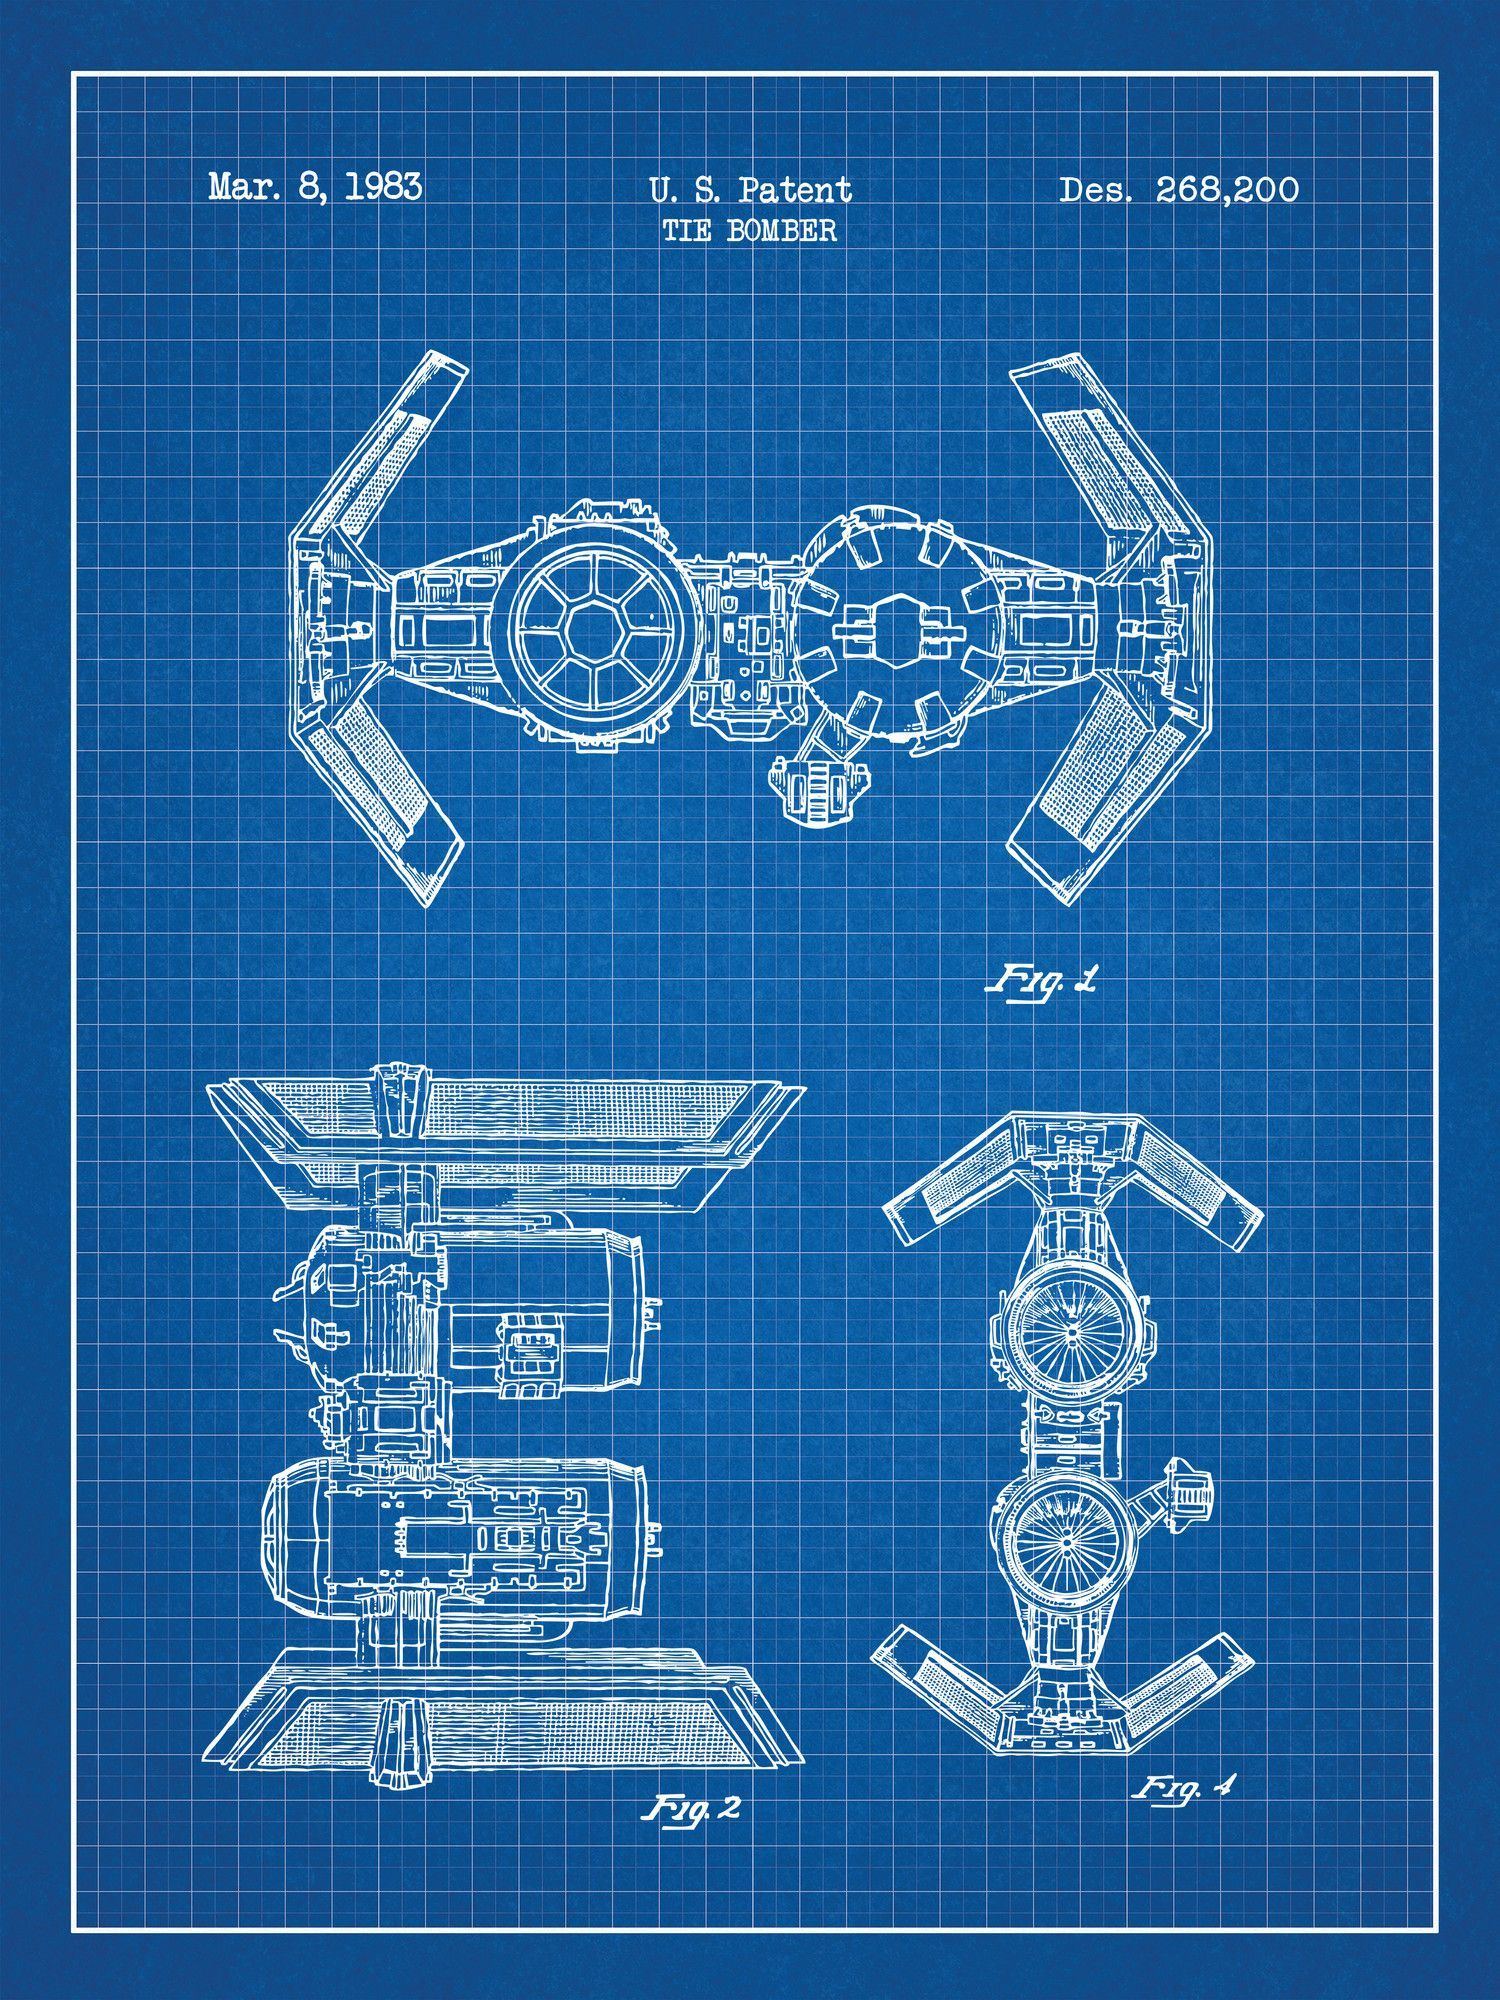 star wars tie bomber blueprint graphic art blueprints because blueprints are cool star. Black Bedroom Furniture Sets. Home Design Ideas